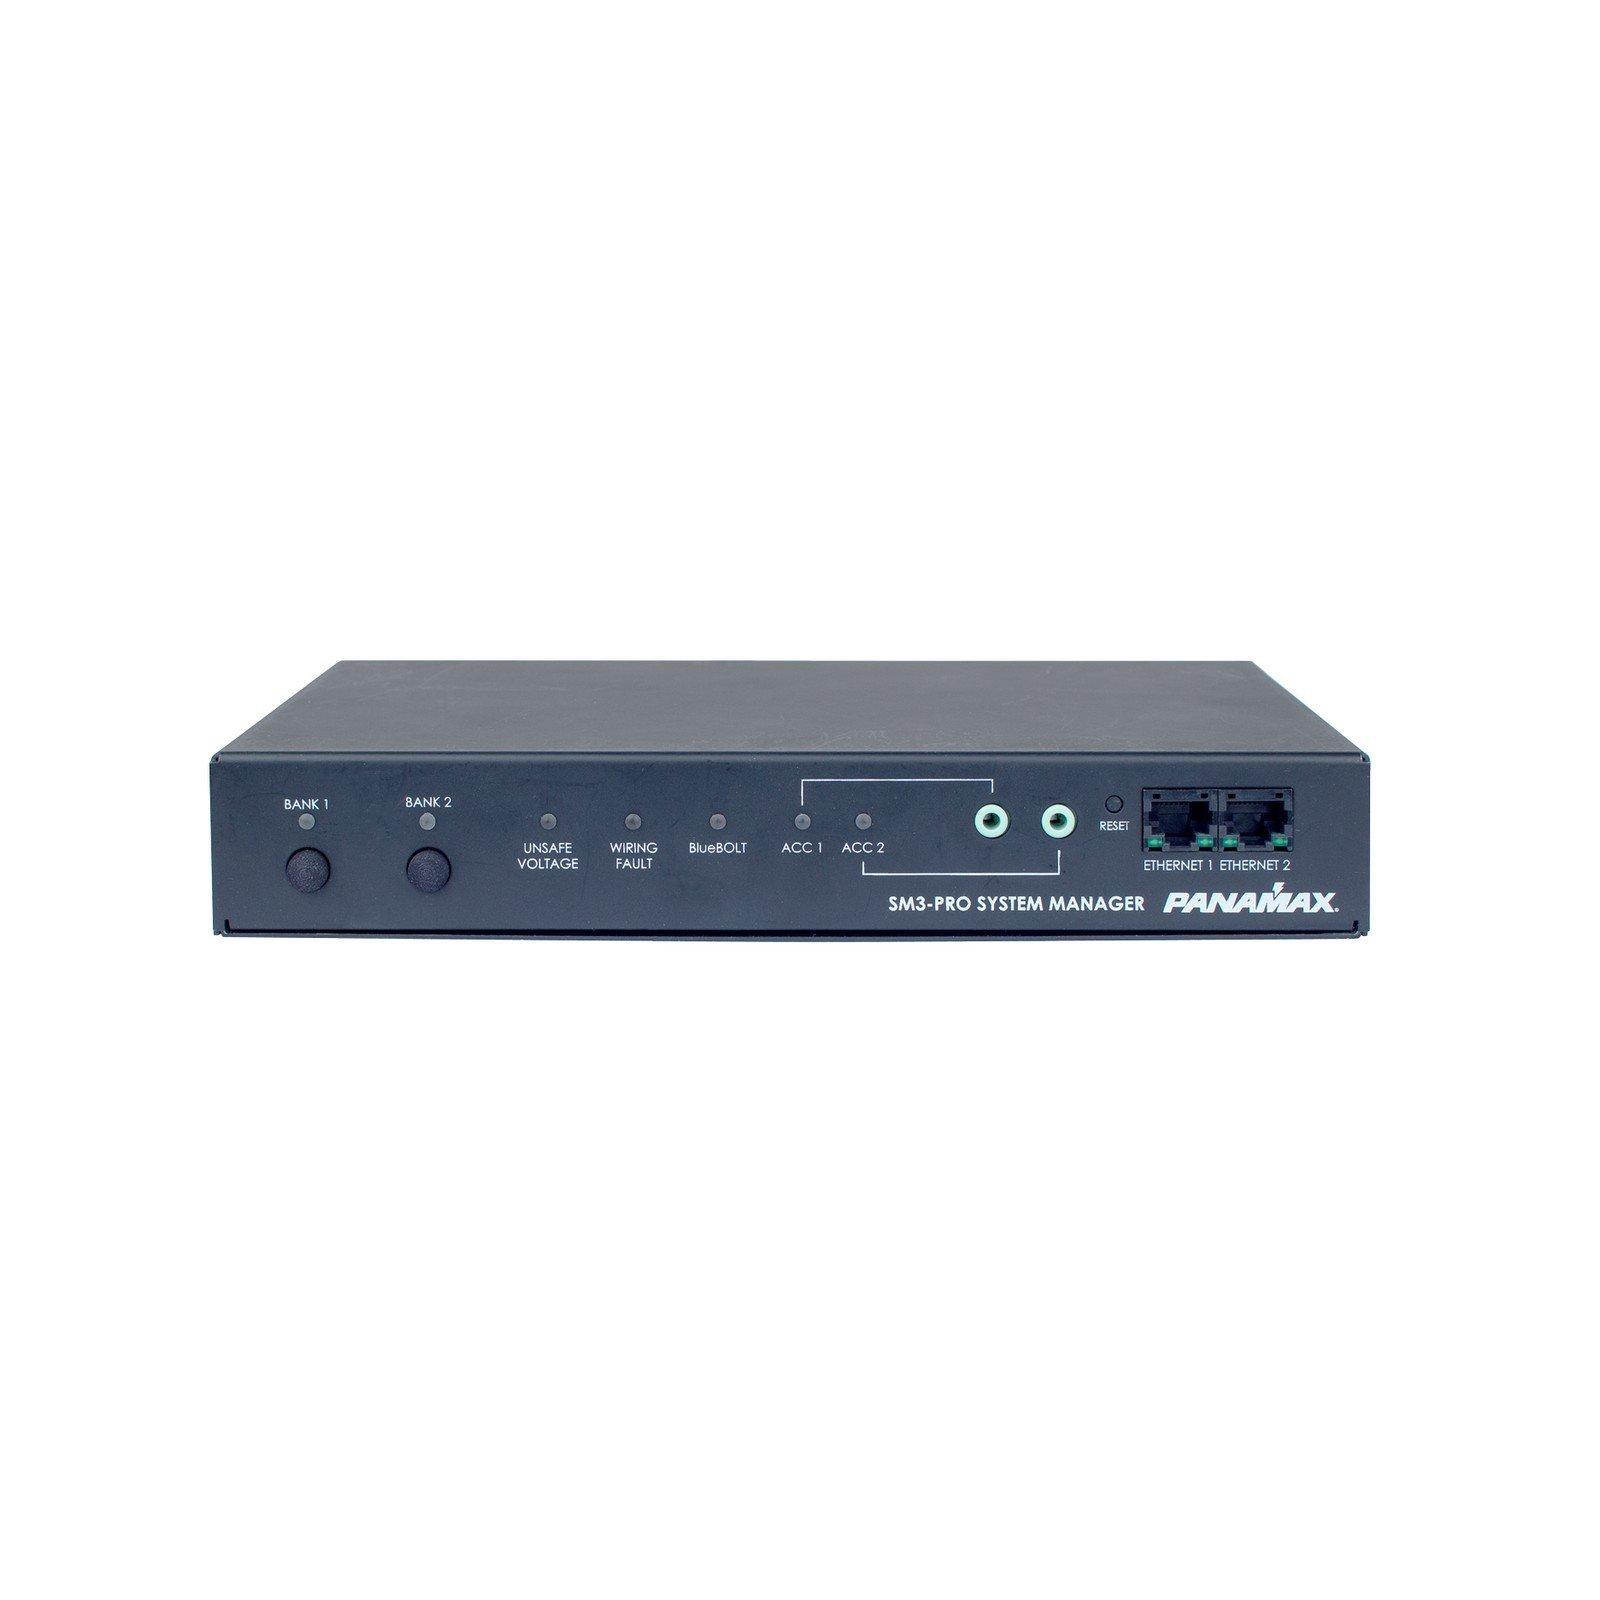 Panamax SM3-PRO | BlueBOLT Power System Manager 3 Outlets AVM RJ45 Jacks